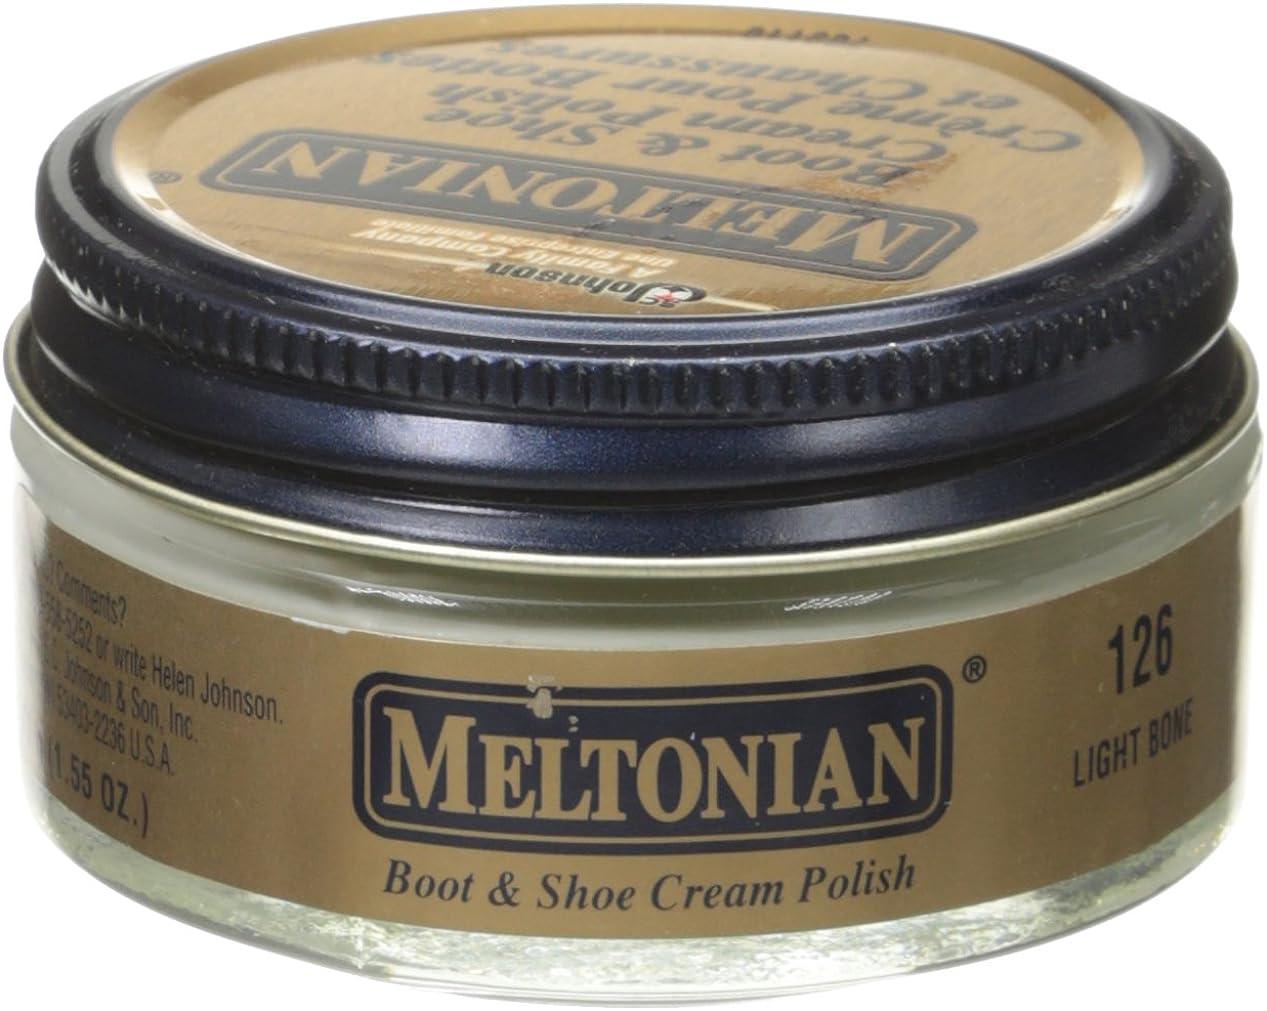 Meltonian Shoe Cream, 1.55 Oz, Light